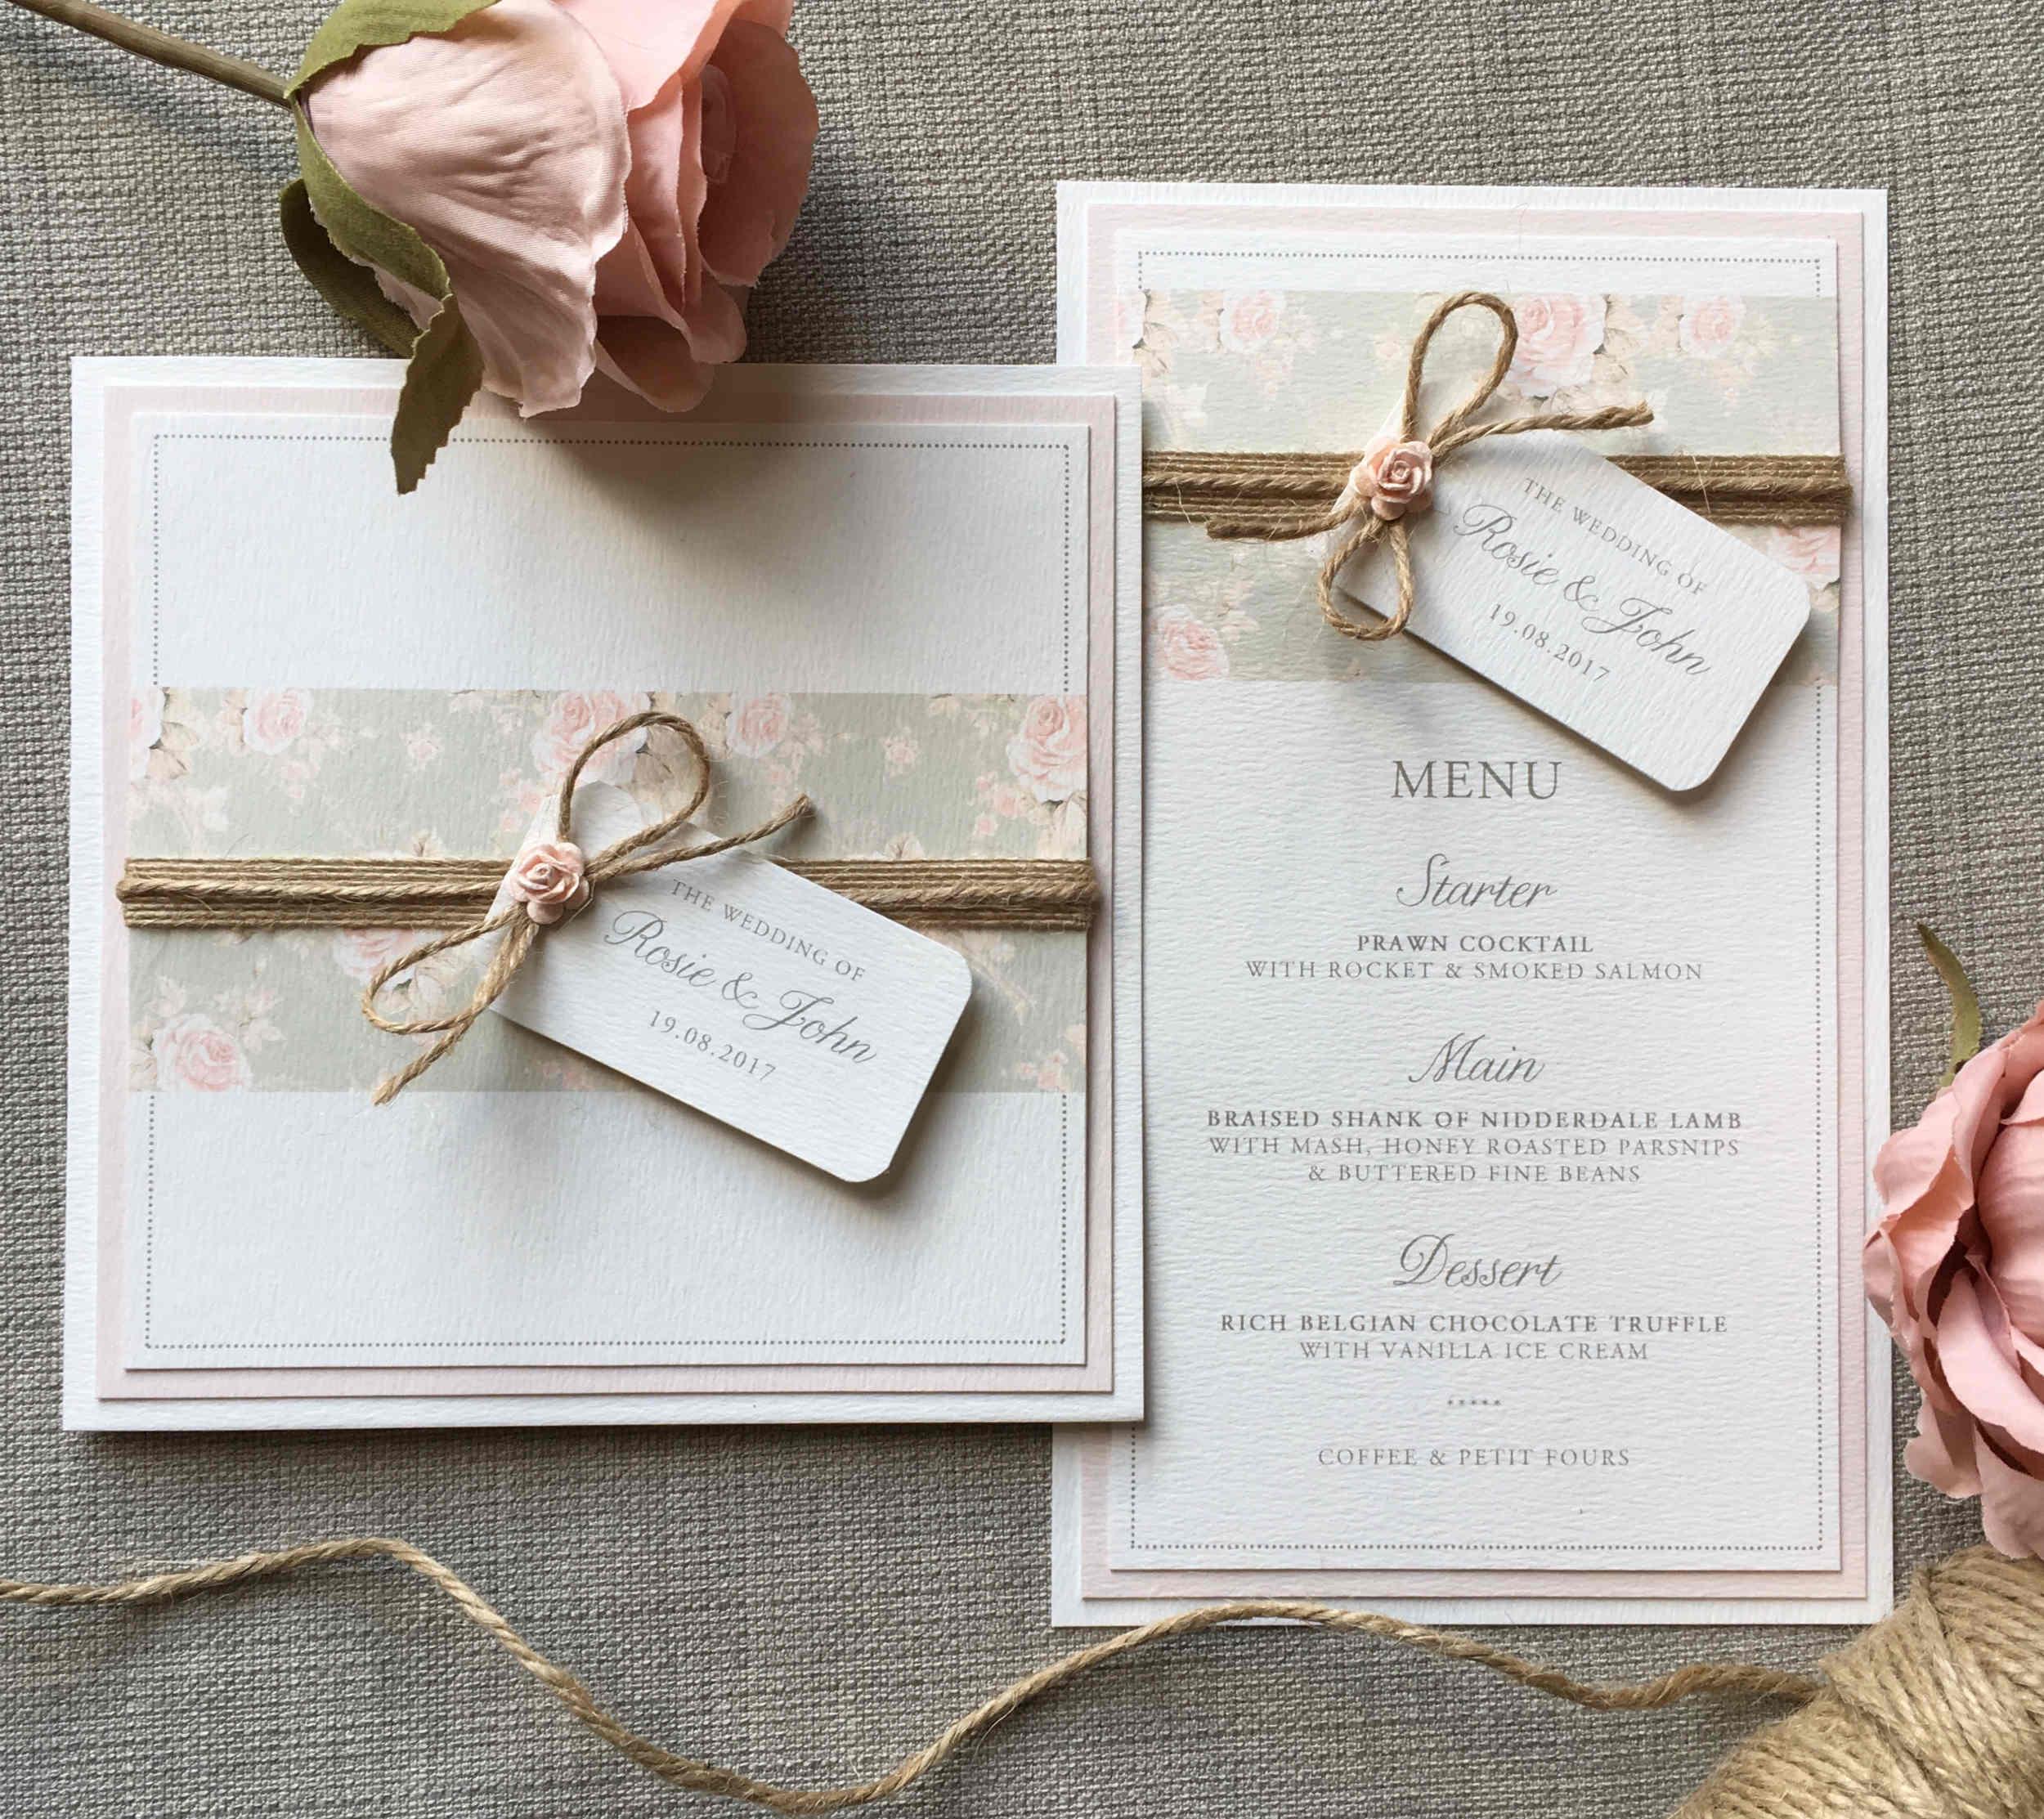 rosie_invitation_menu.jpg